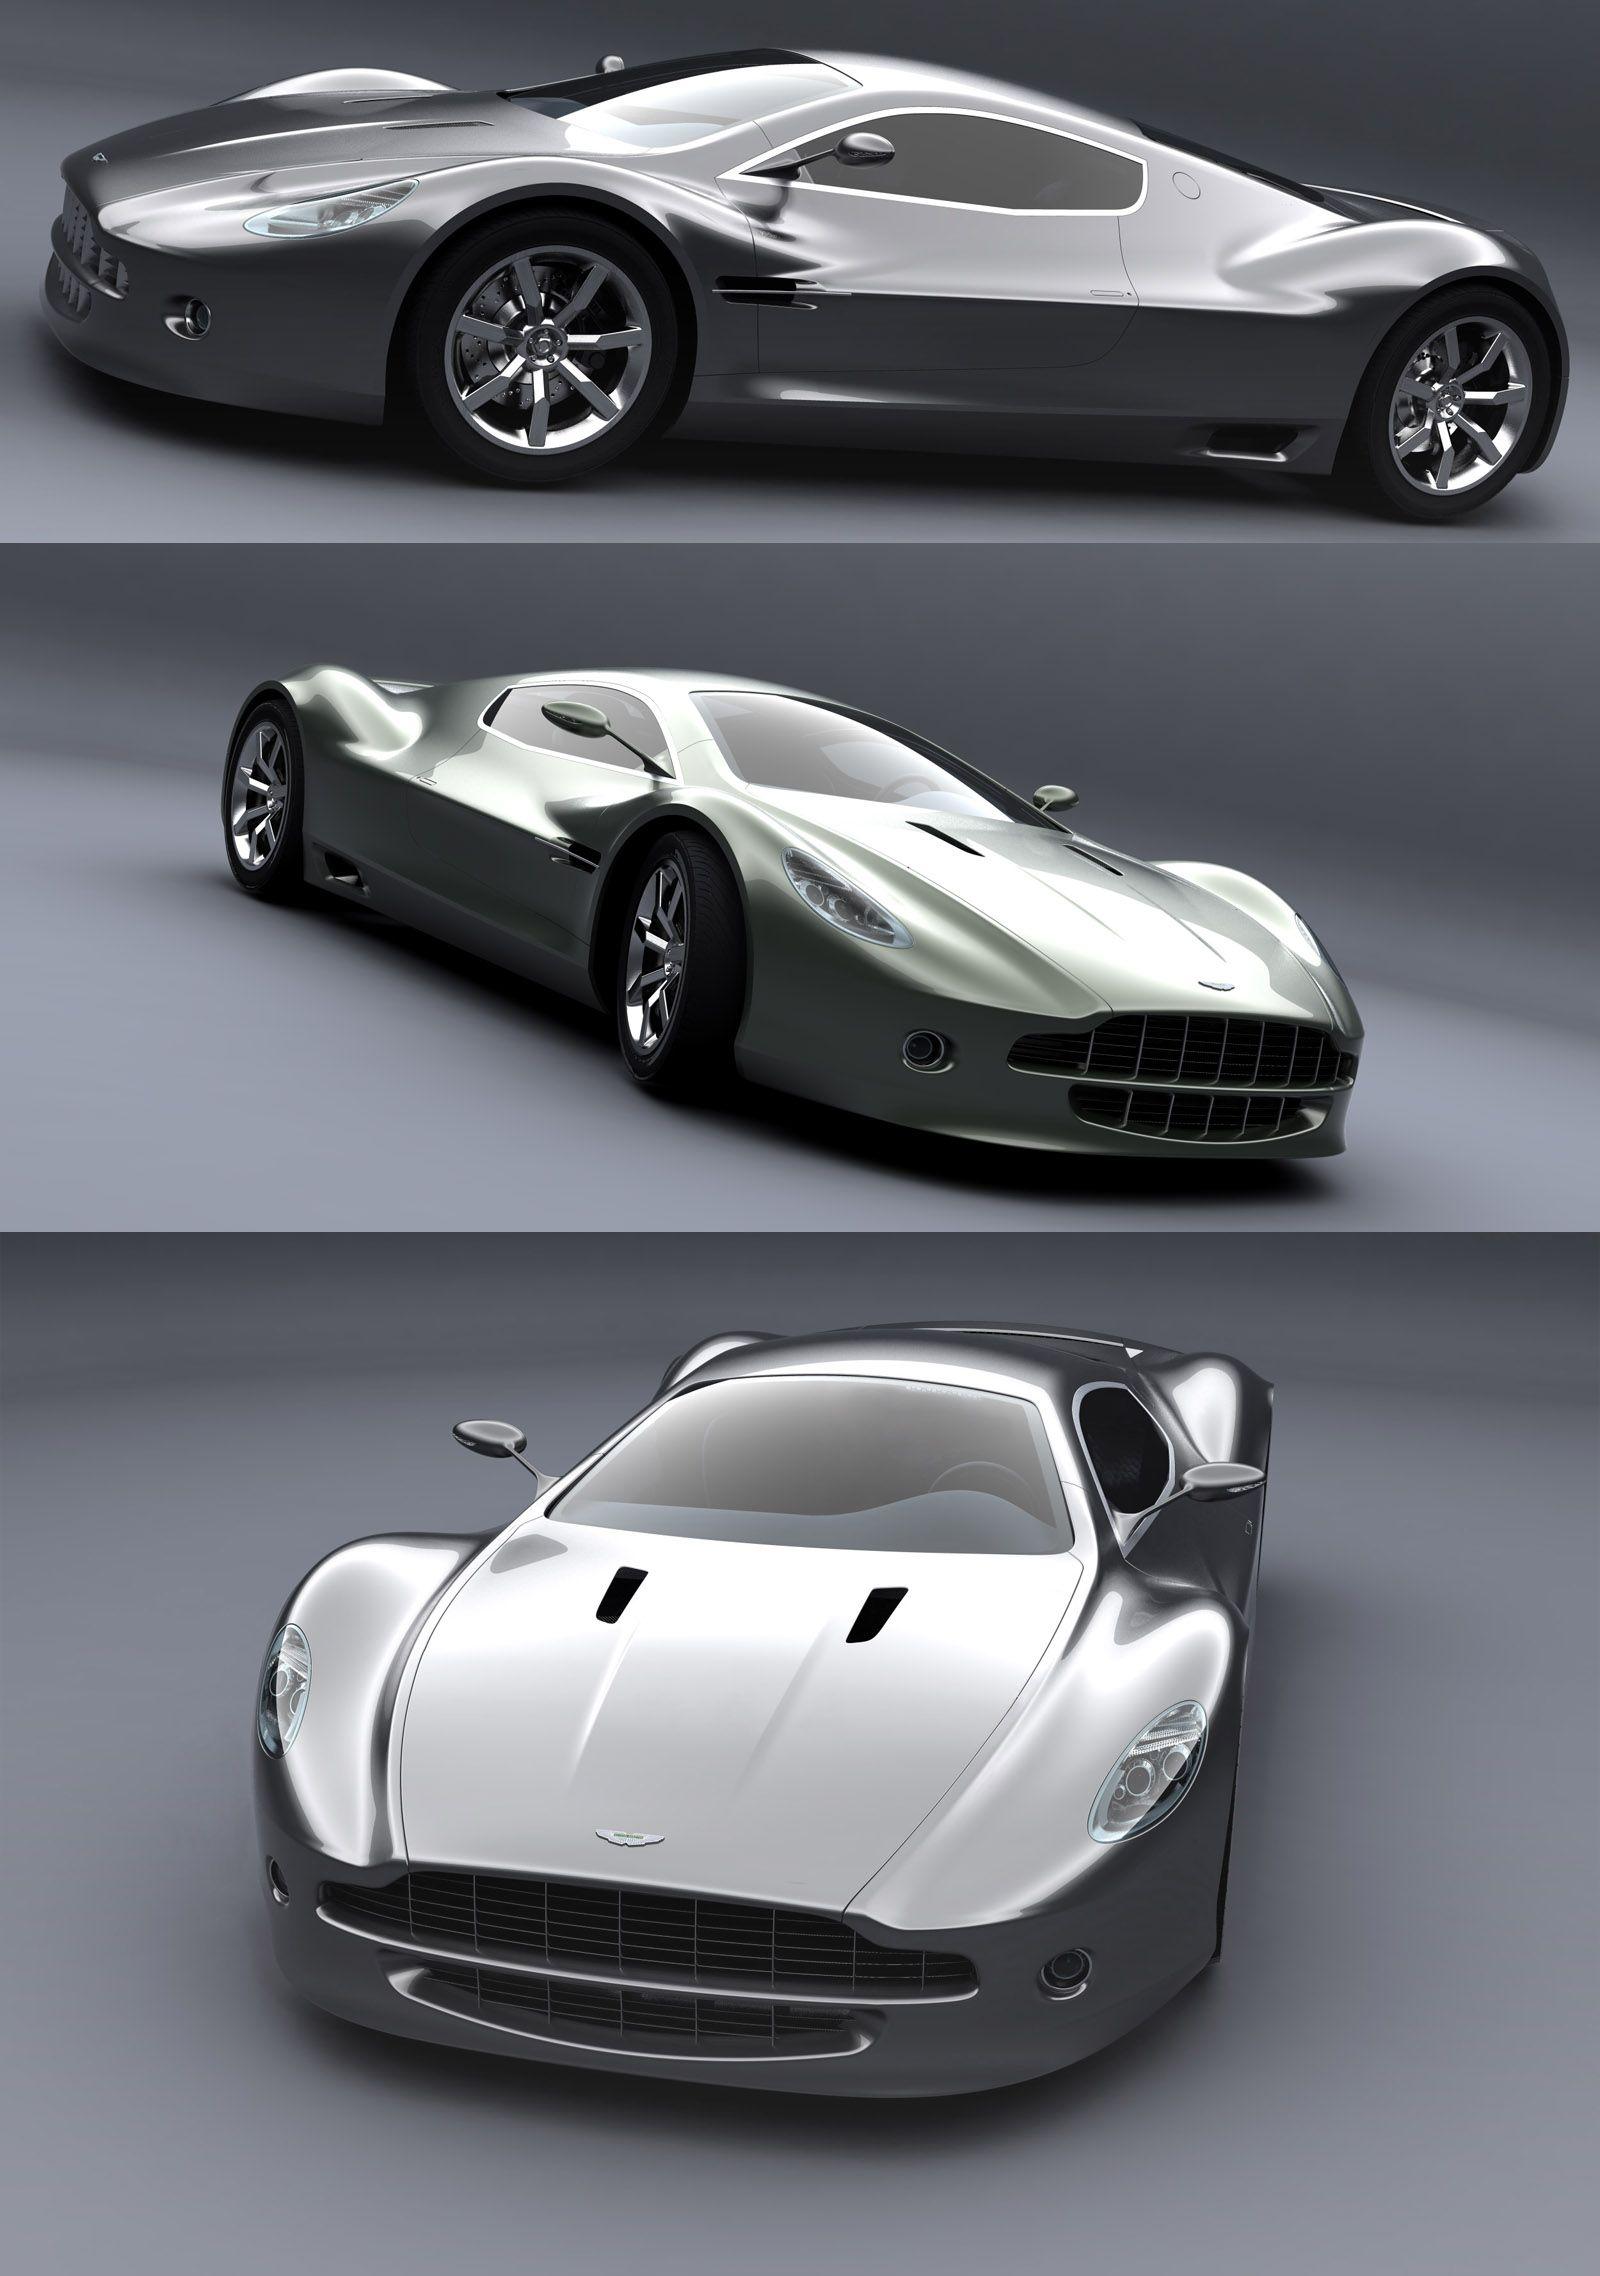 Aston Martin Am V10 Futuristic Car Aerodynamic Sportscar Supercar Concept Car Aston Martin Sports Cars Luxury Super Cars